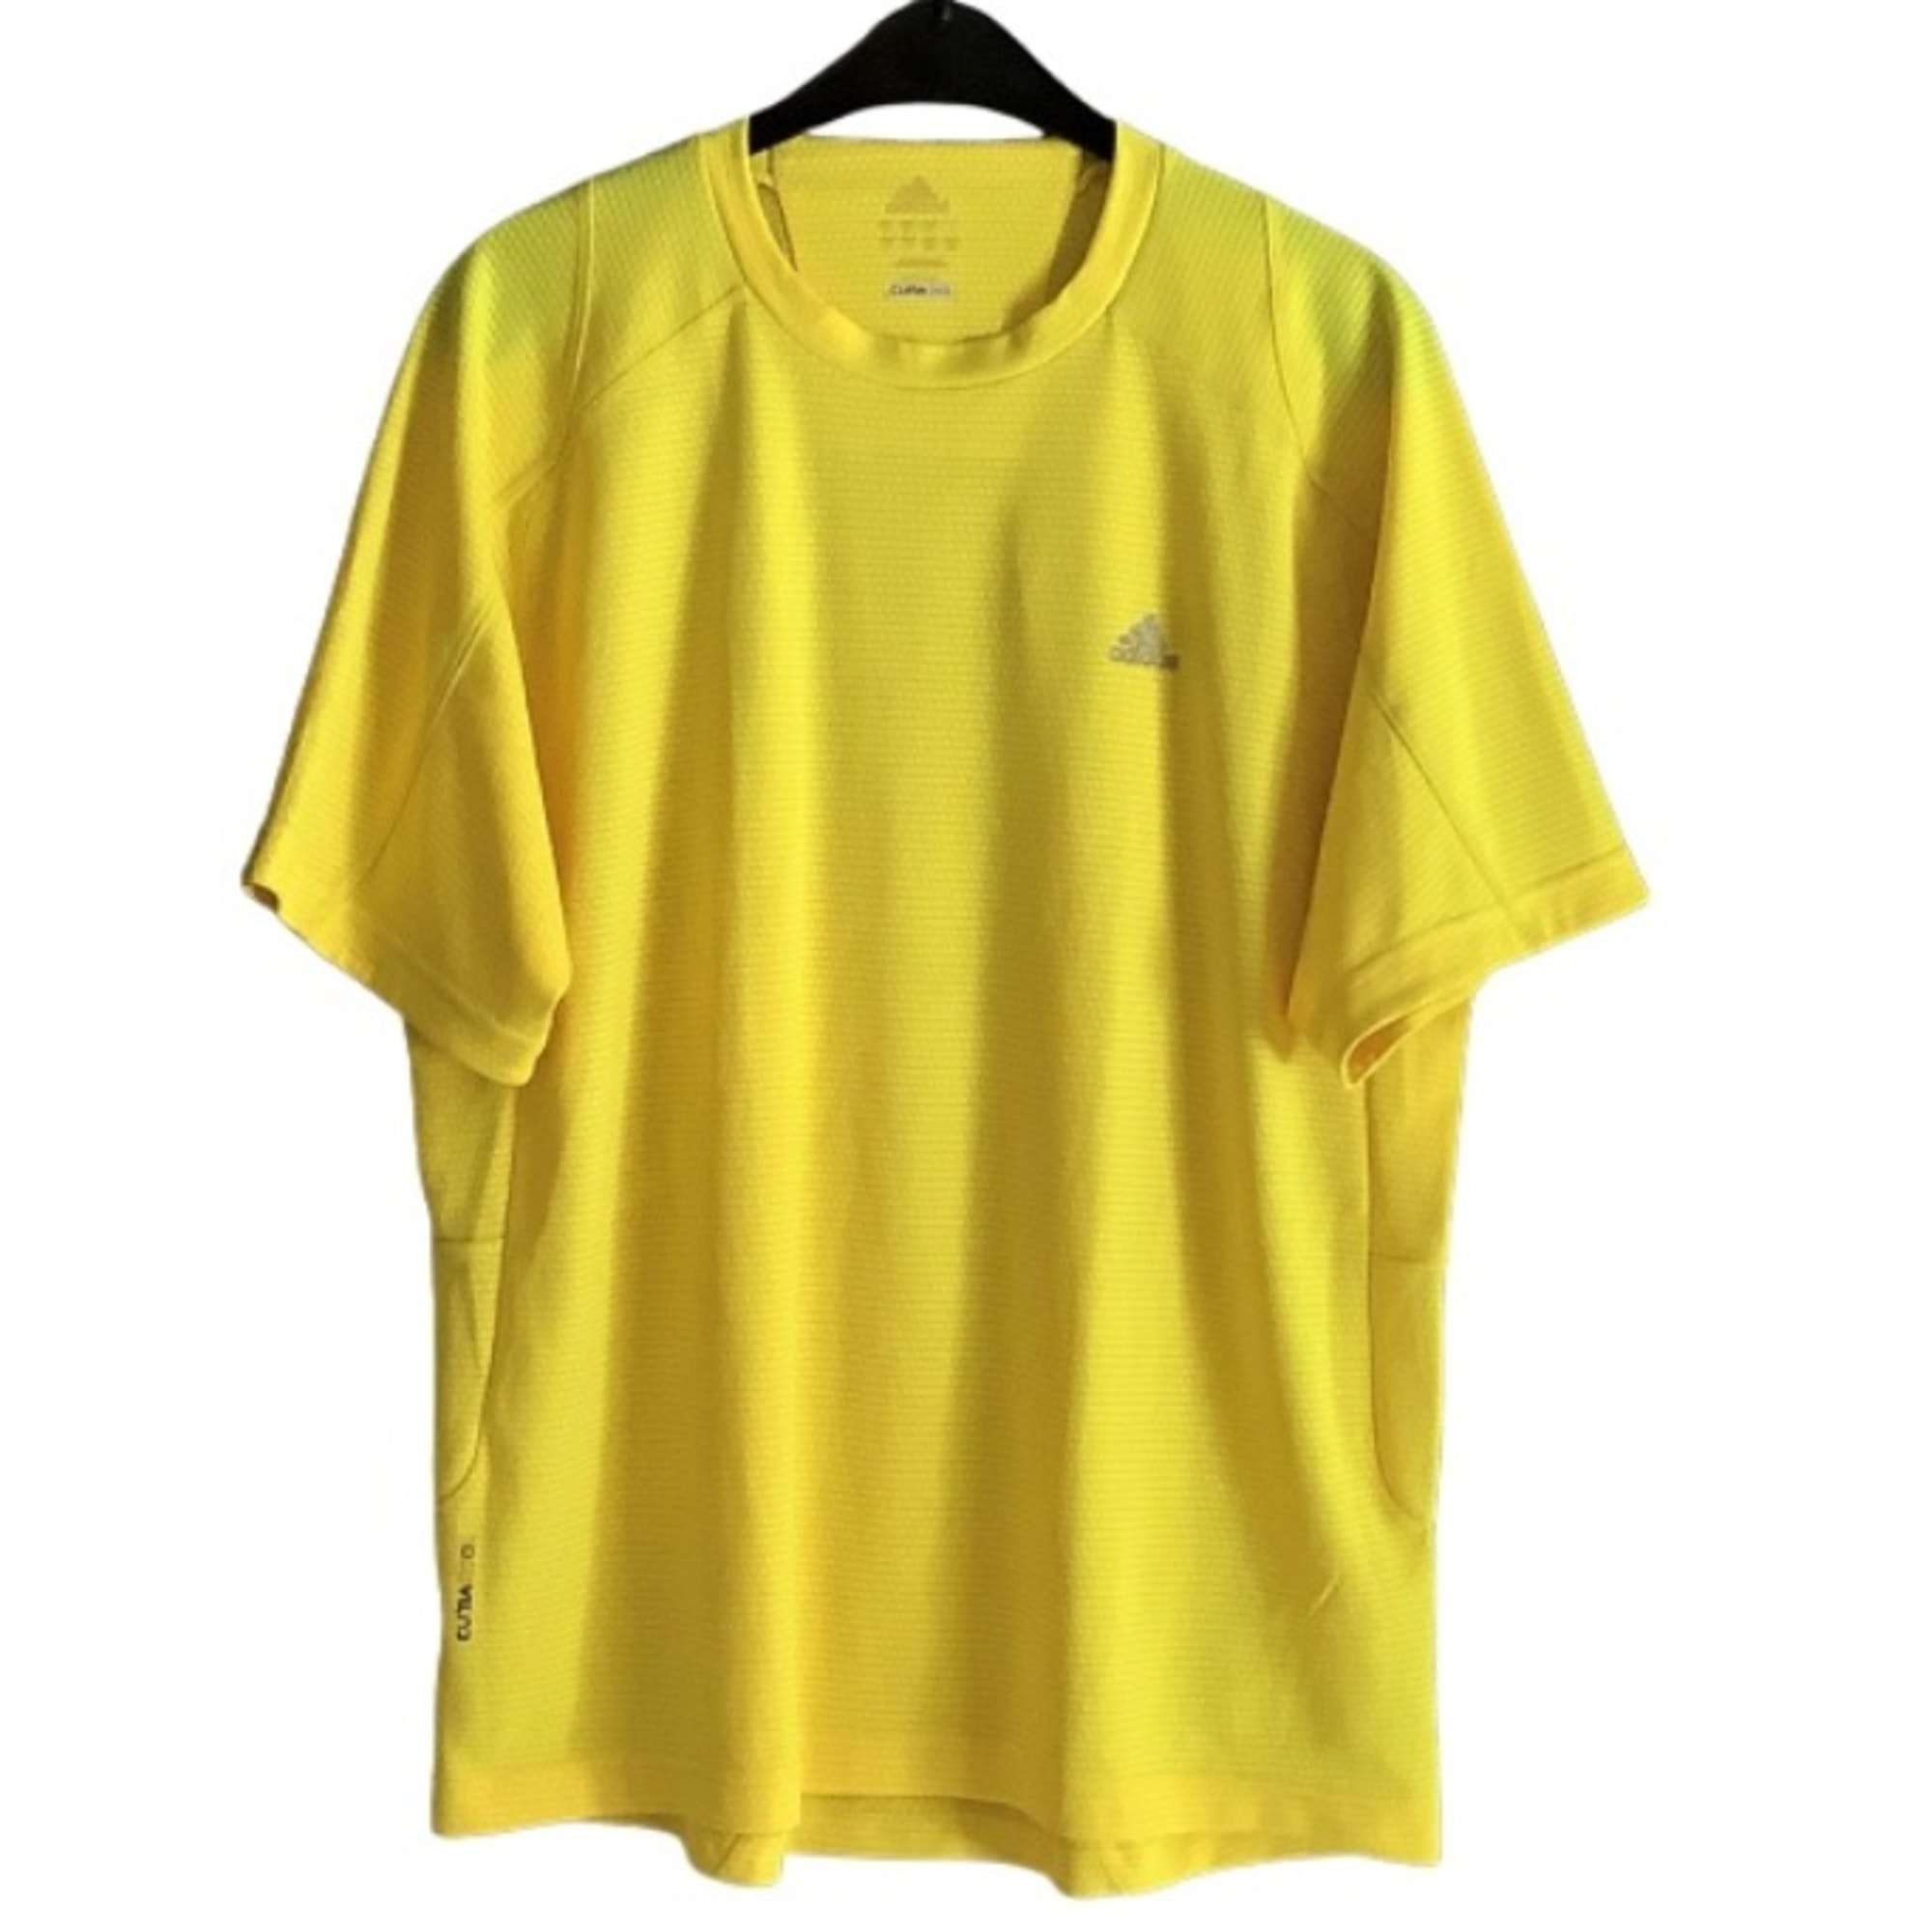 Tee-shirt ADIDAS Jaune